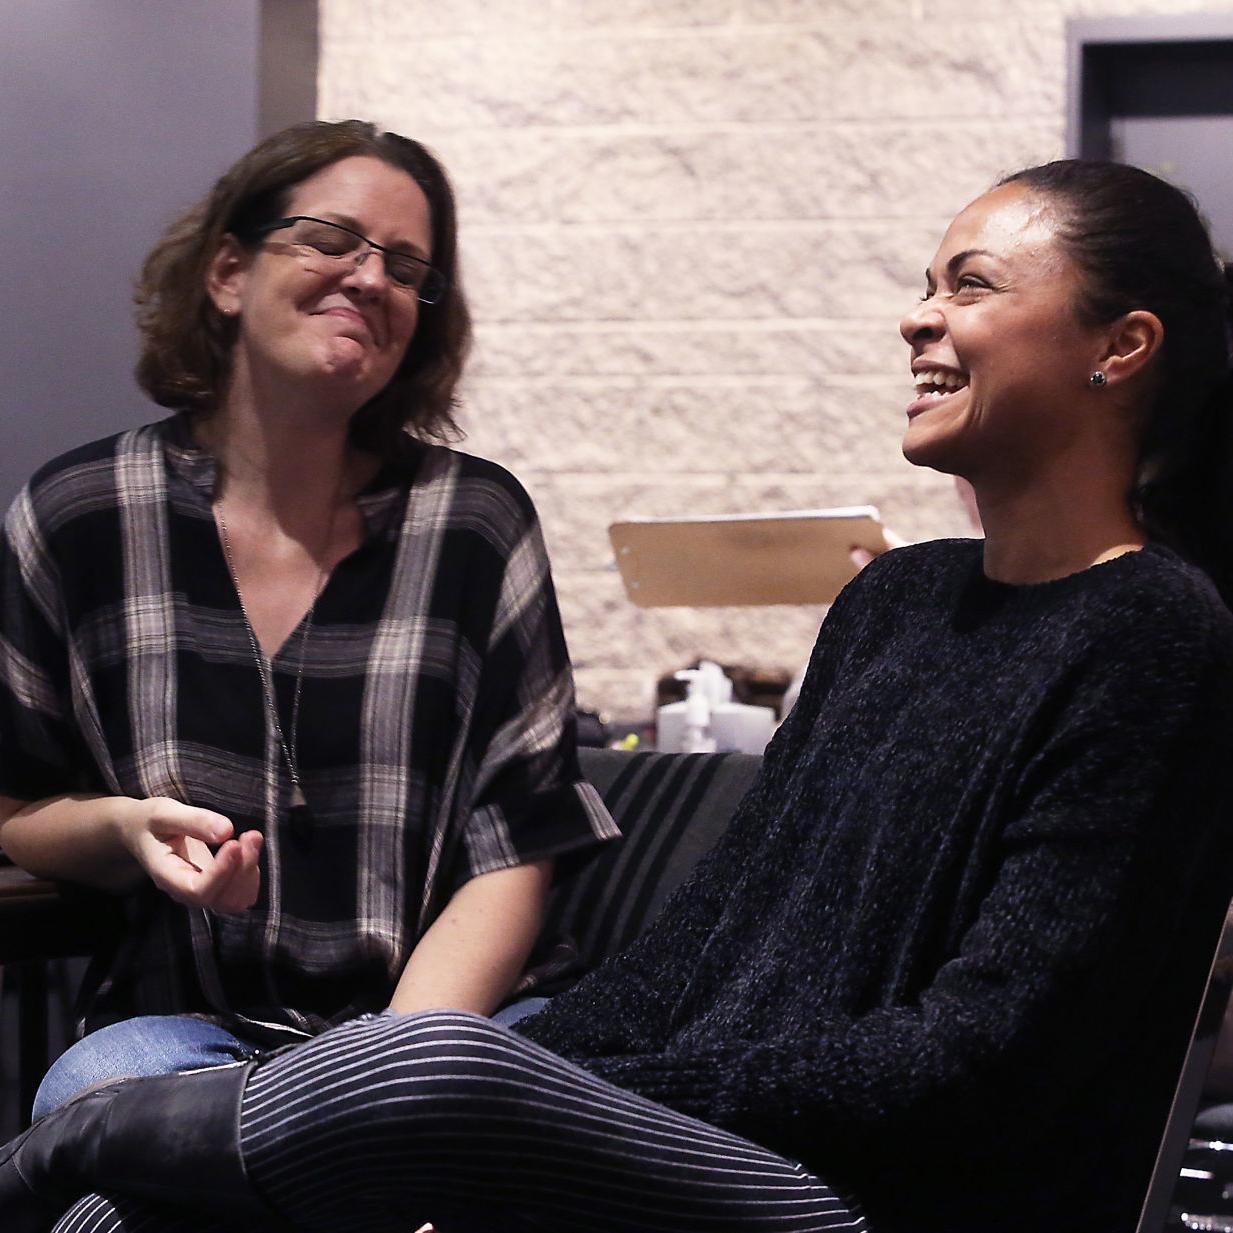 Broadway star Karen Olivo comes home to do 'Fun Home' | Arts